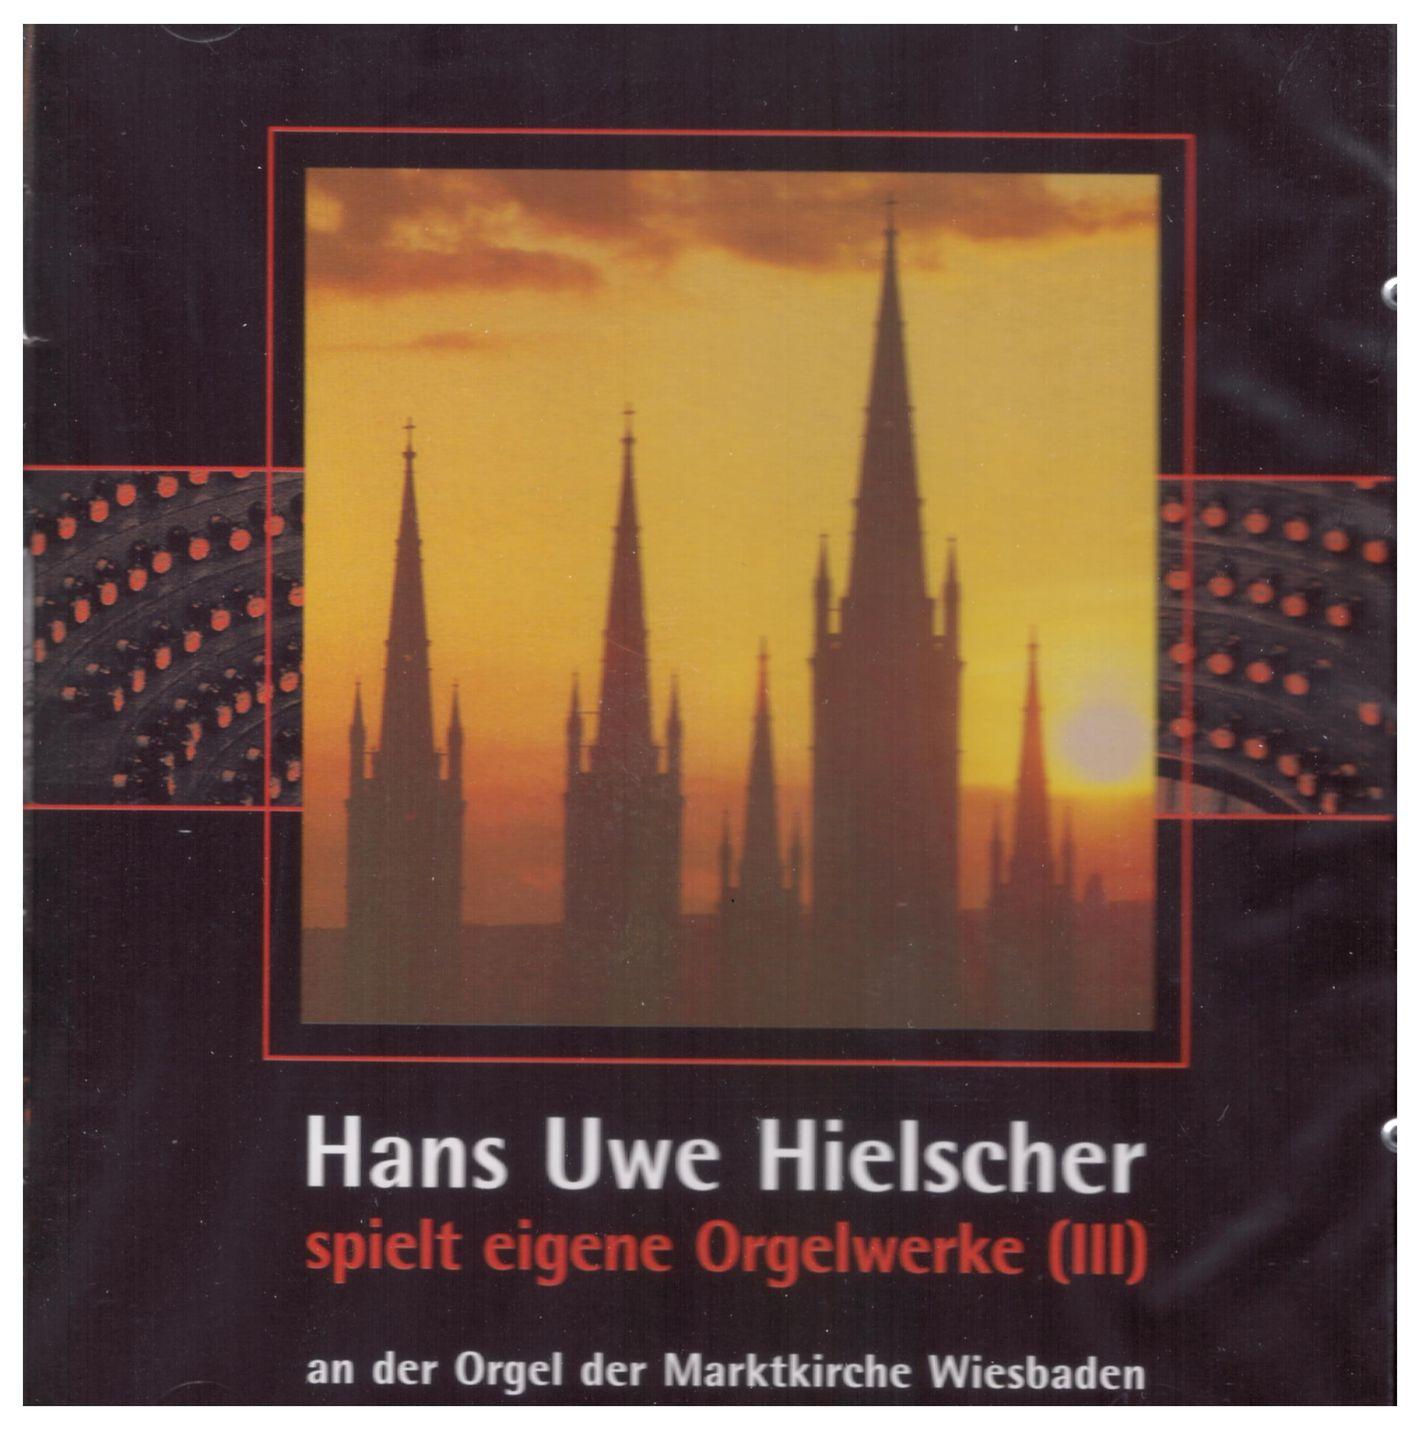 Hans Uwe Hielscher plays own organ works, Vol. III